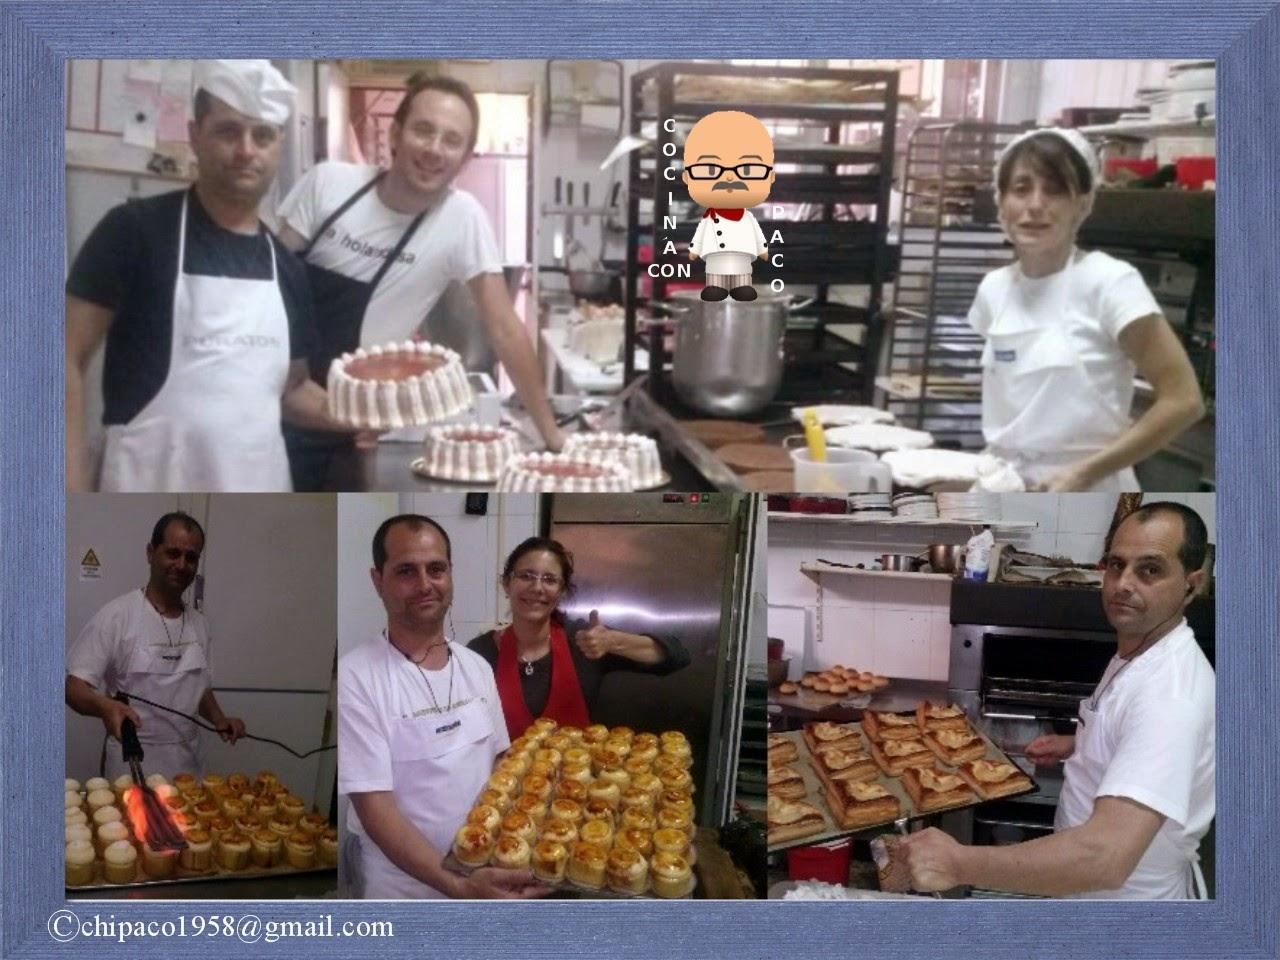 Cocina con paco pasteler a la holandesa - Cocina con paco ...